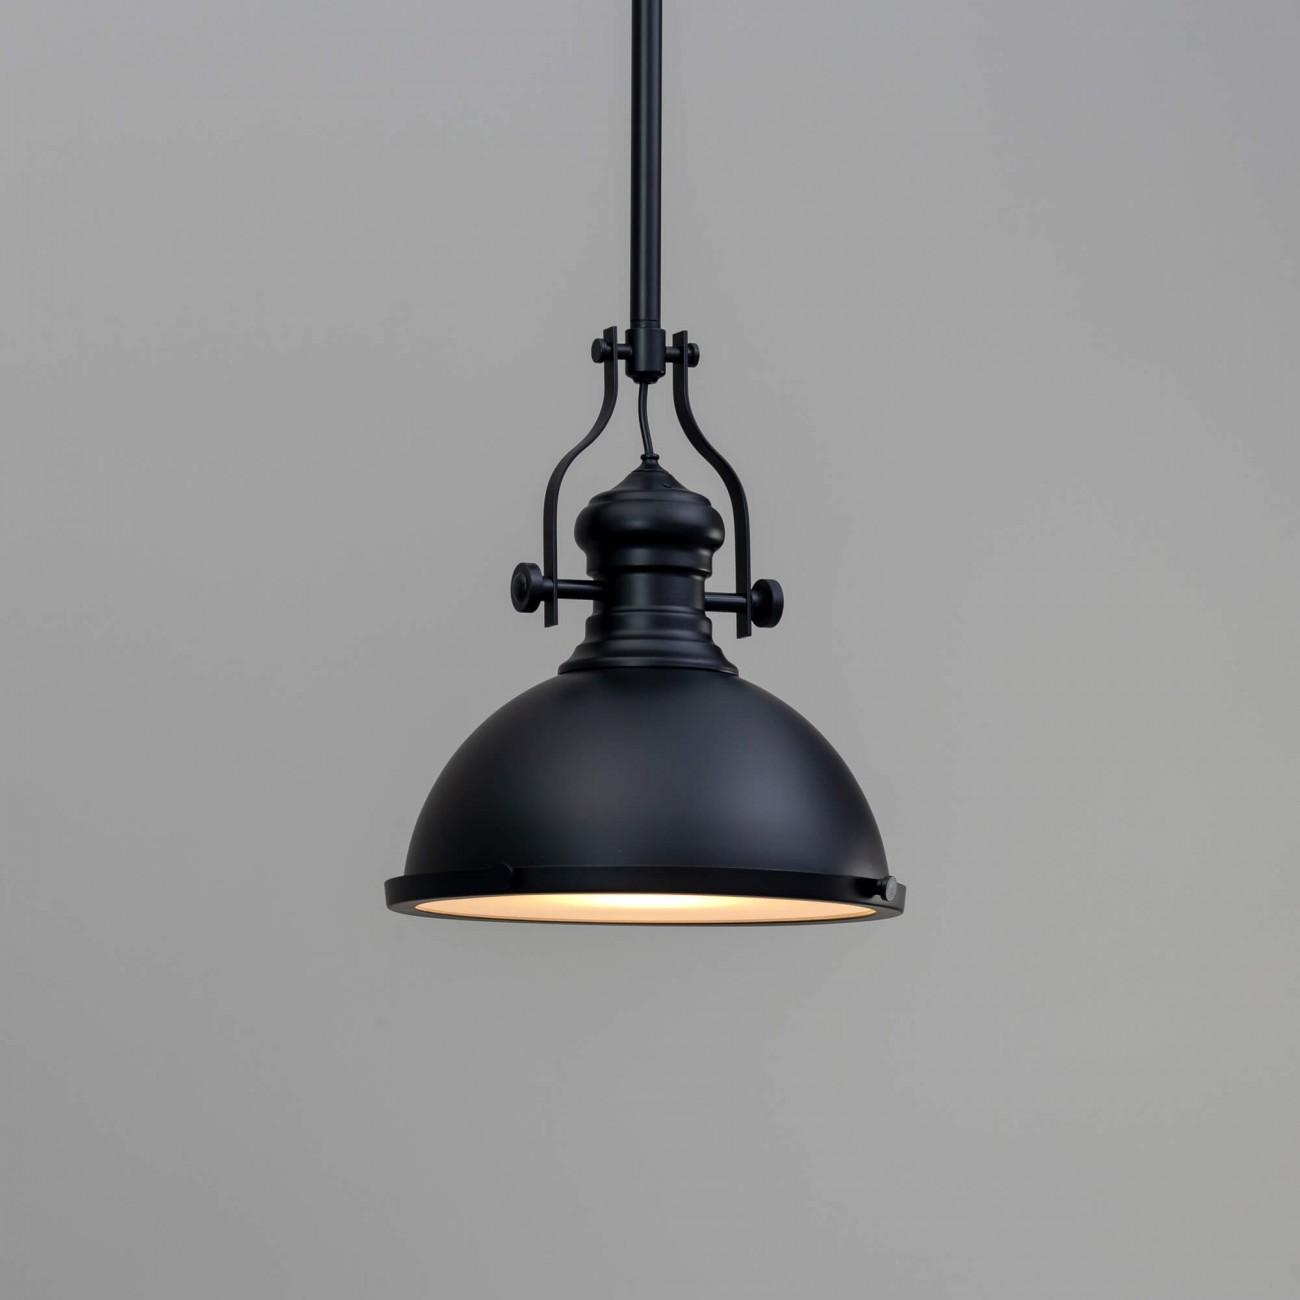 Black Industrial Pendant Light For Kitchen Neris Kosilight